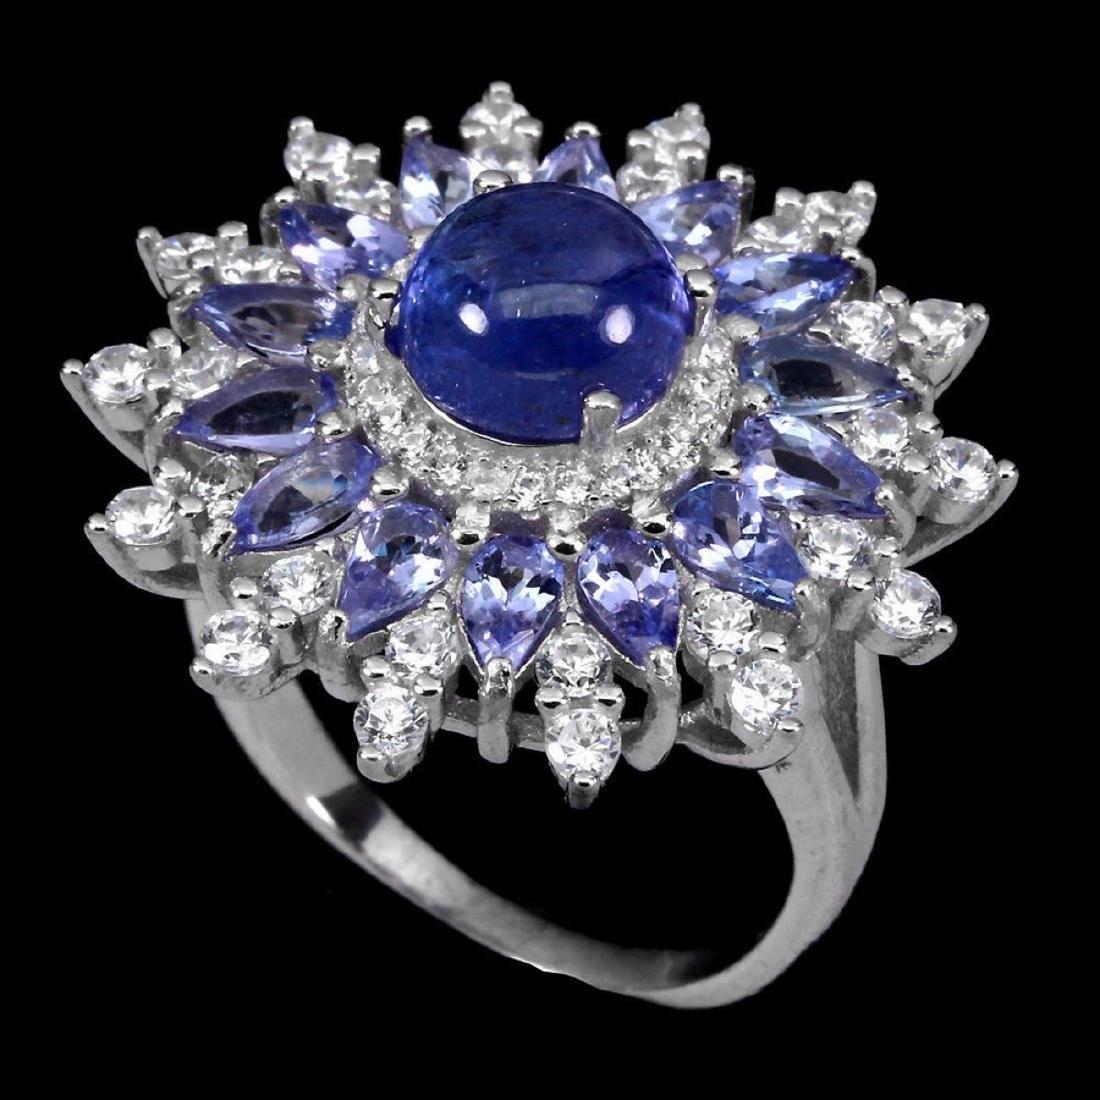 Natural Top Blue Violet Tanzanite 34.61 Ct  Ring